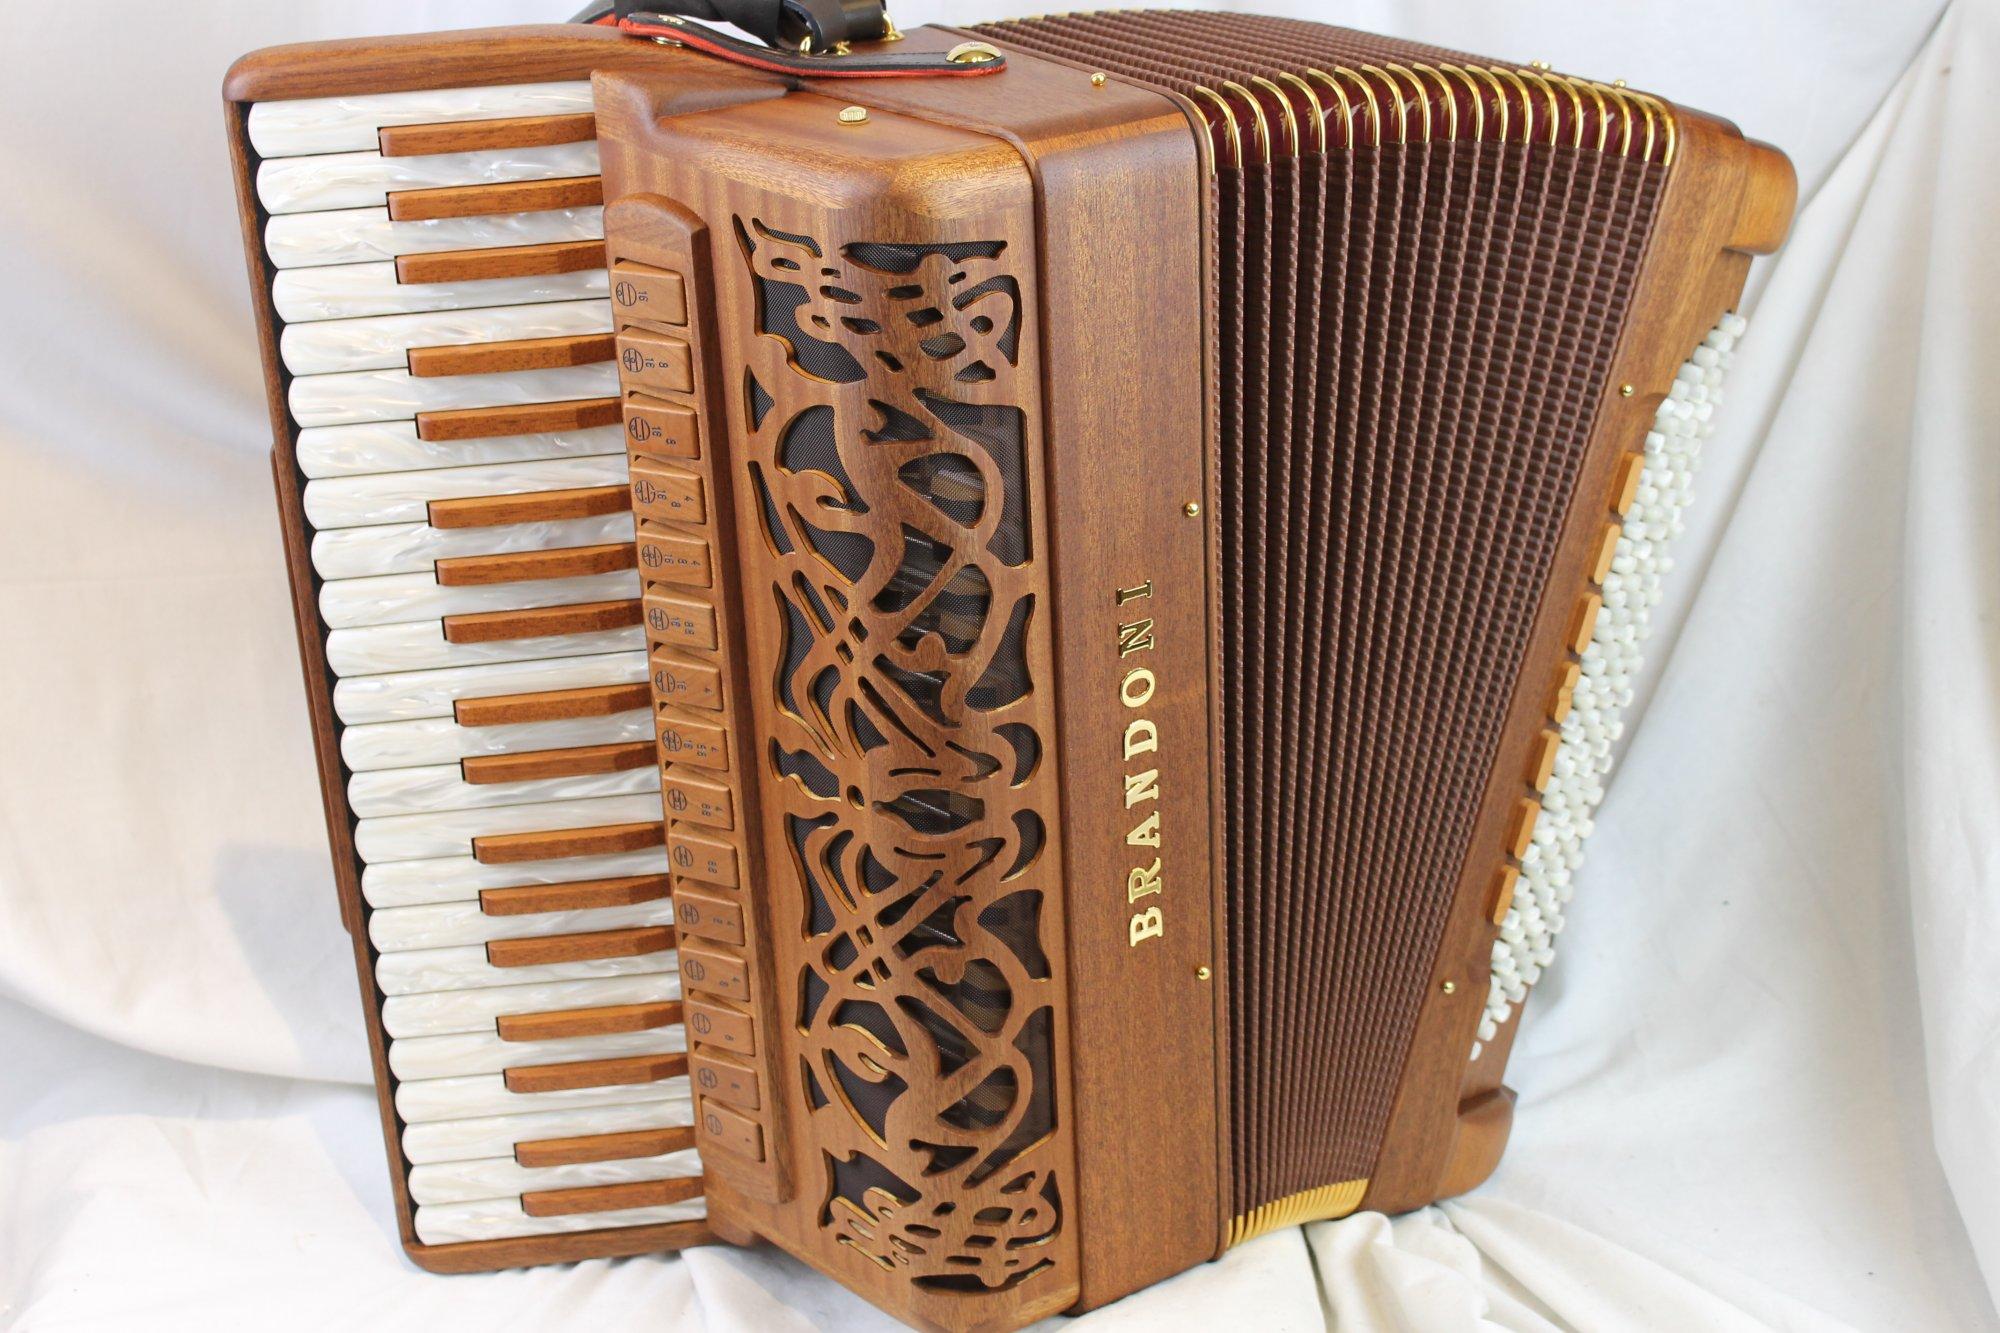 NEW Mahogany Brandoni 148W Infinity Piano Accordion LMMH 41 120